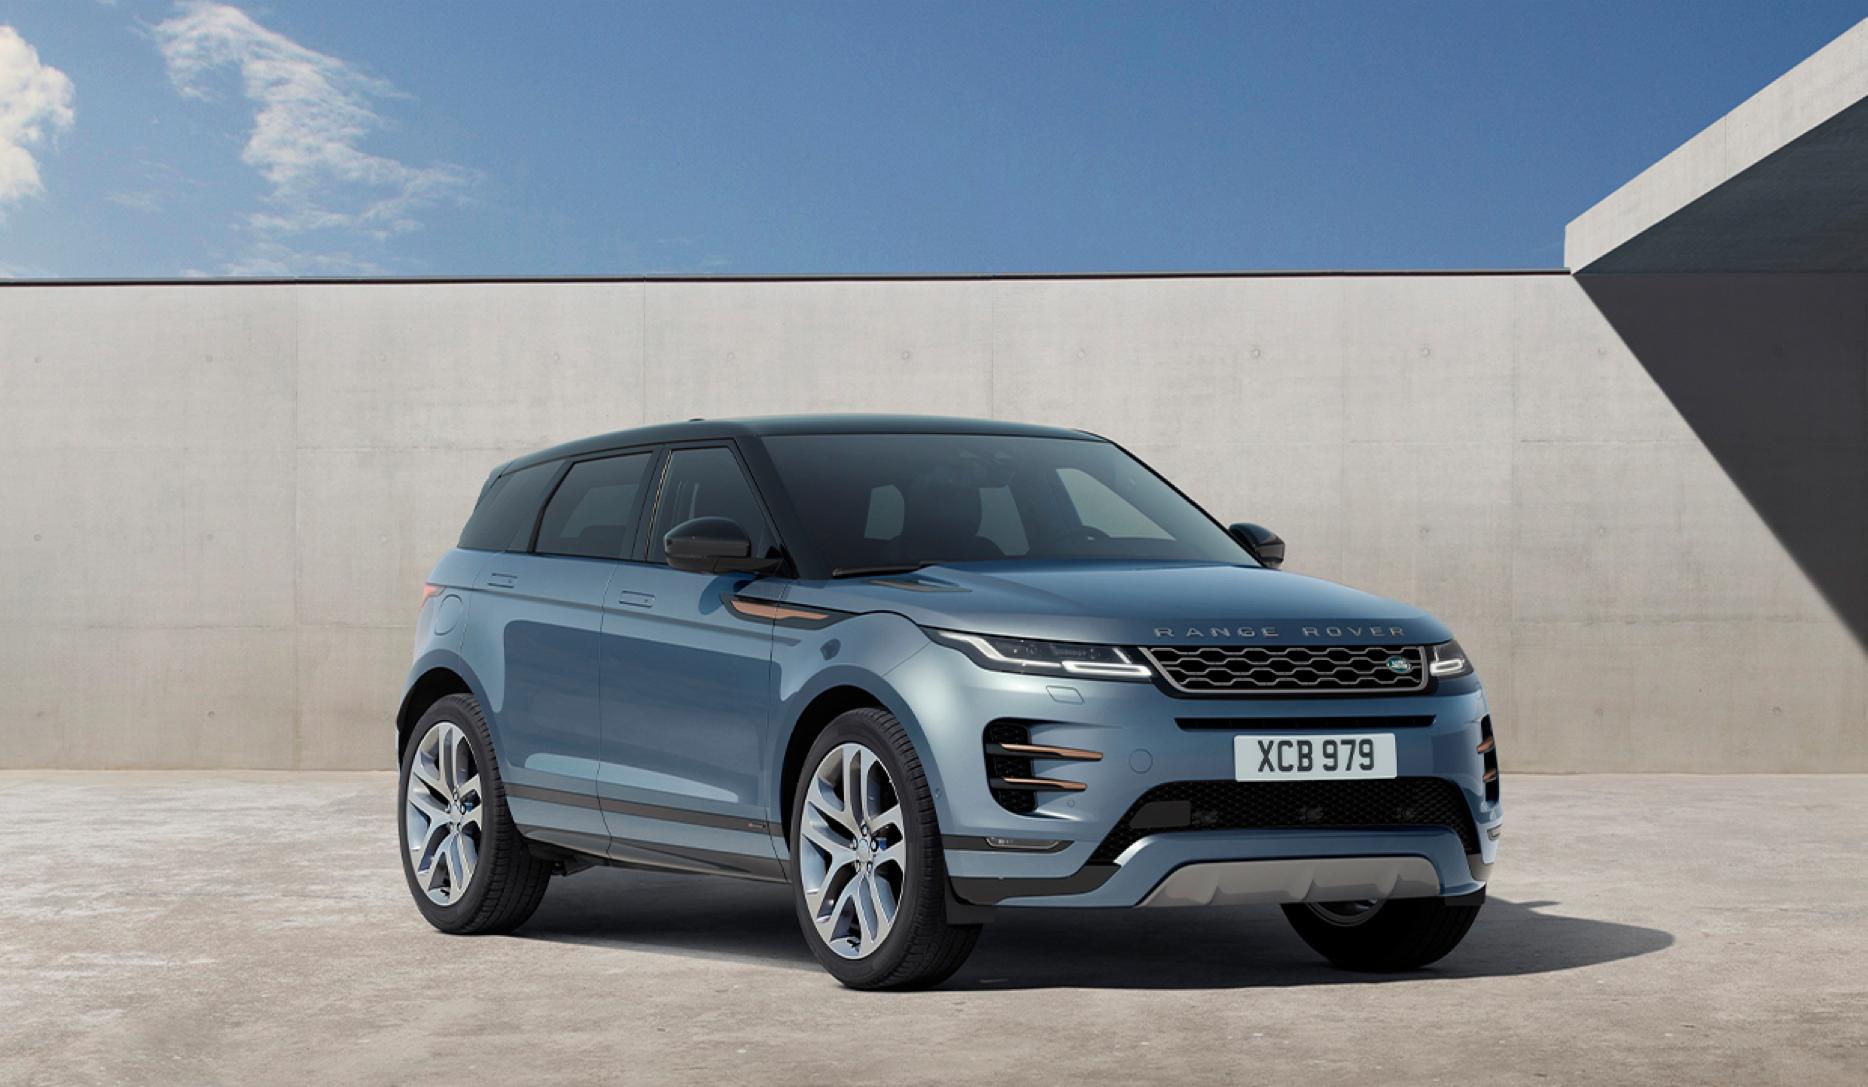 Range Rover Evoque - newest arrival